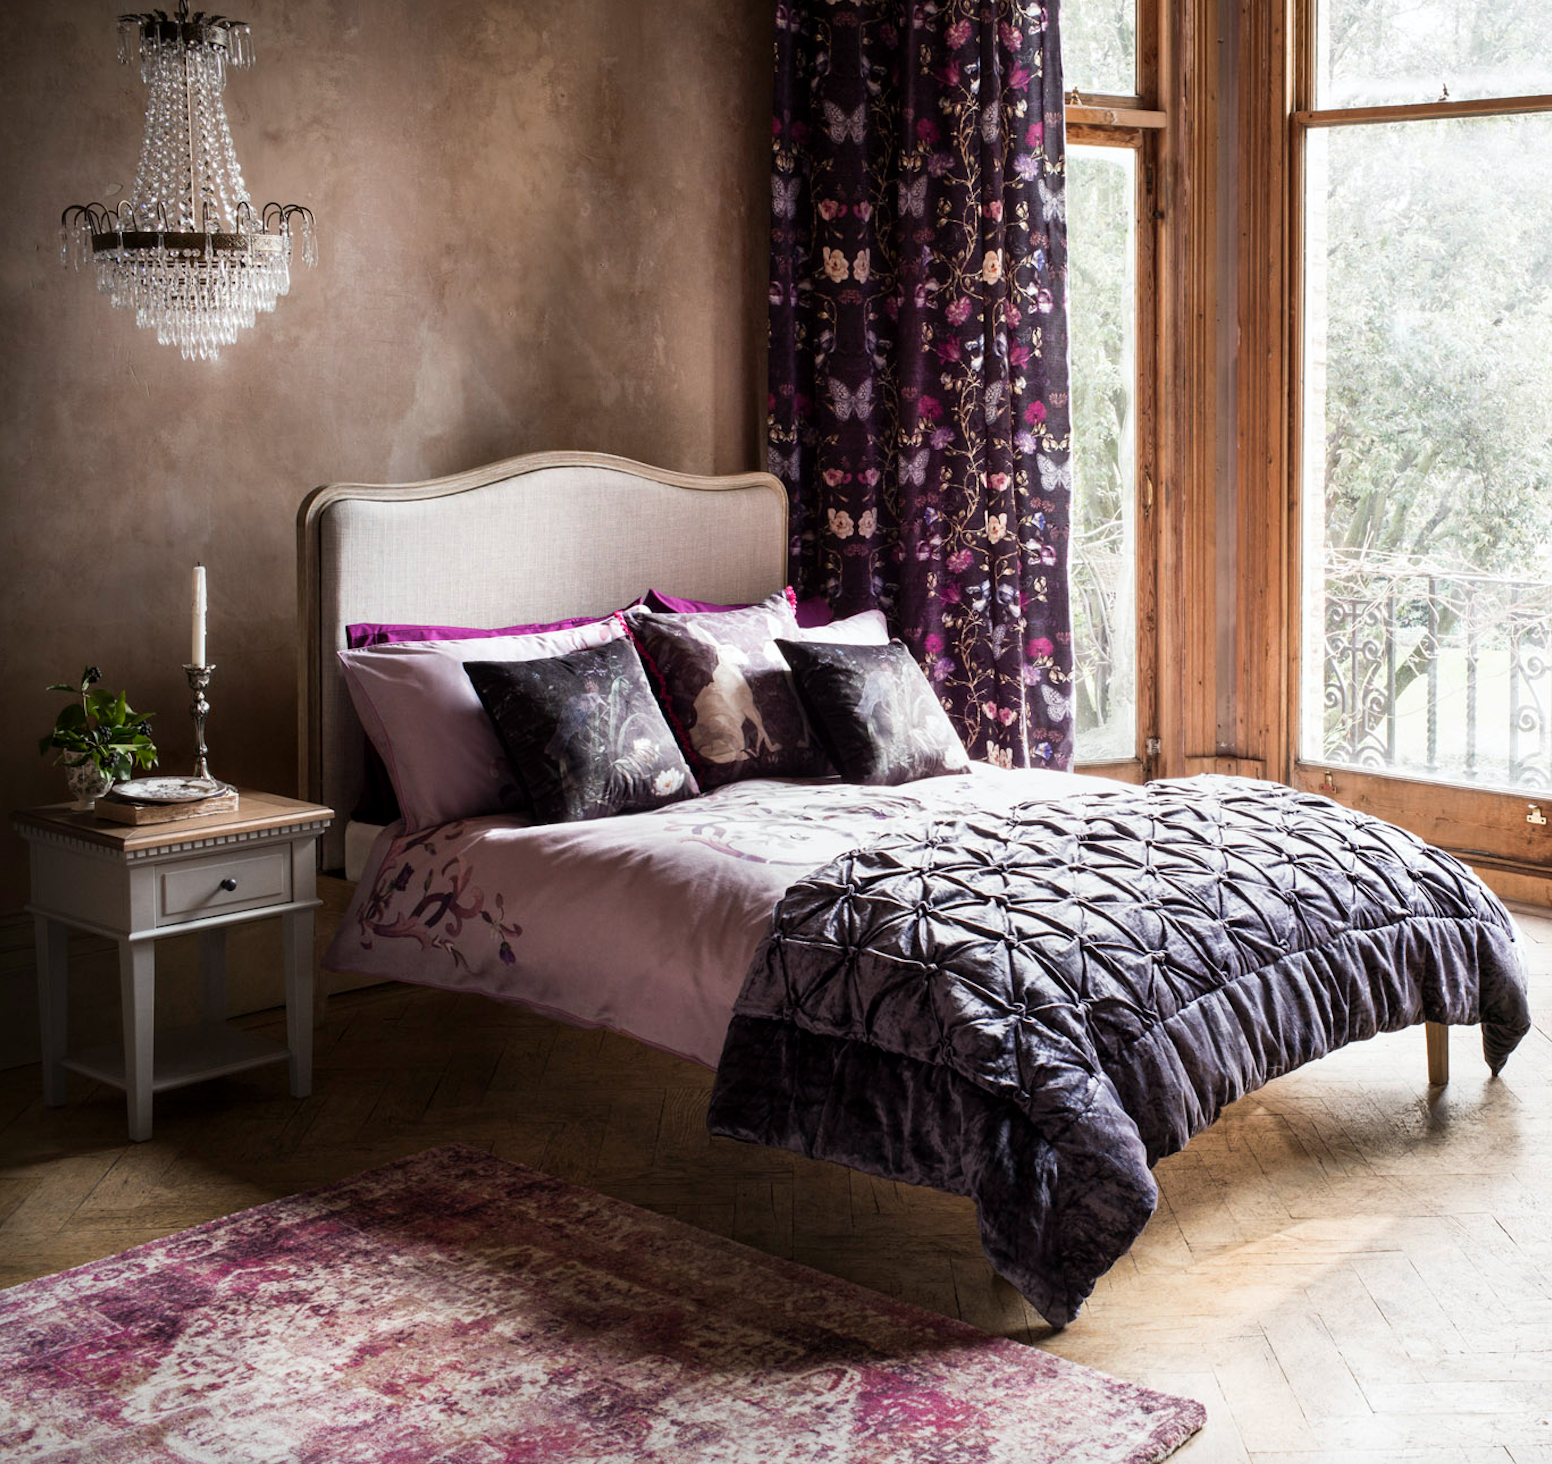 Image of: Romantic Bedroom Ideas Decorating Ideas Interiors